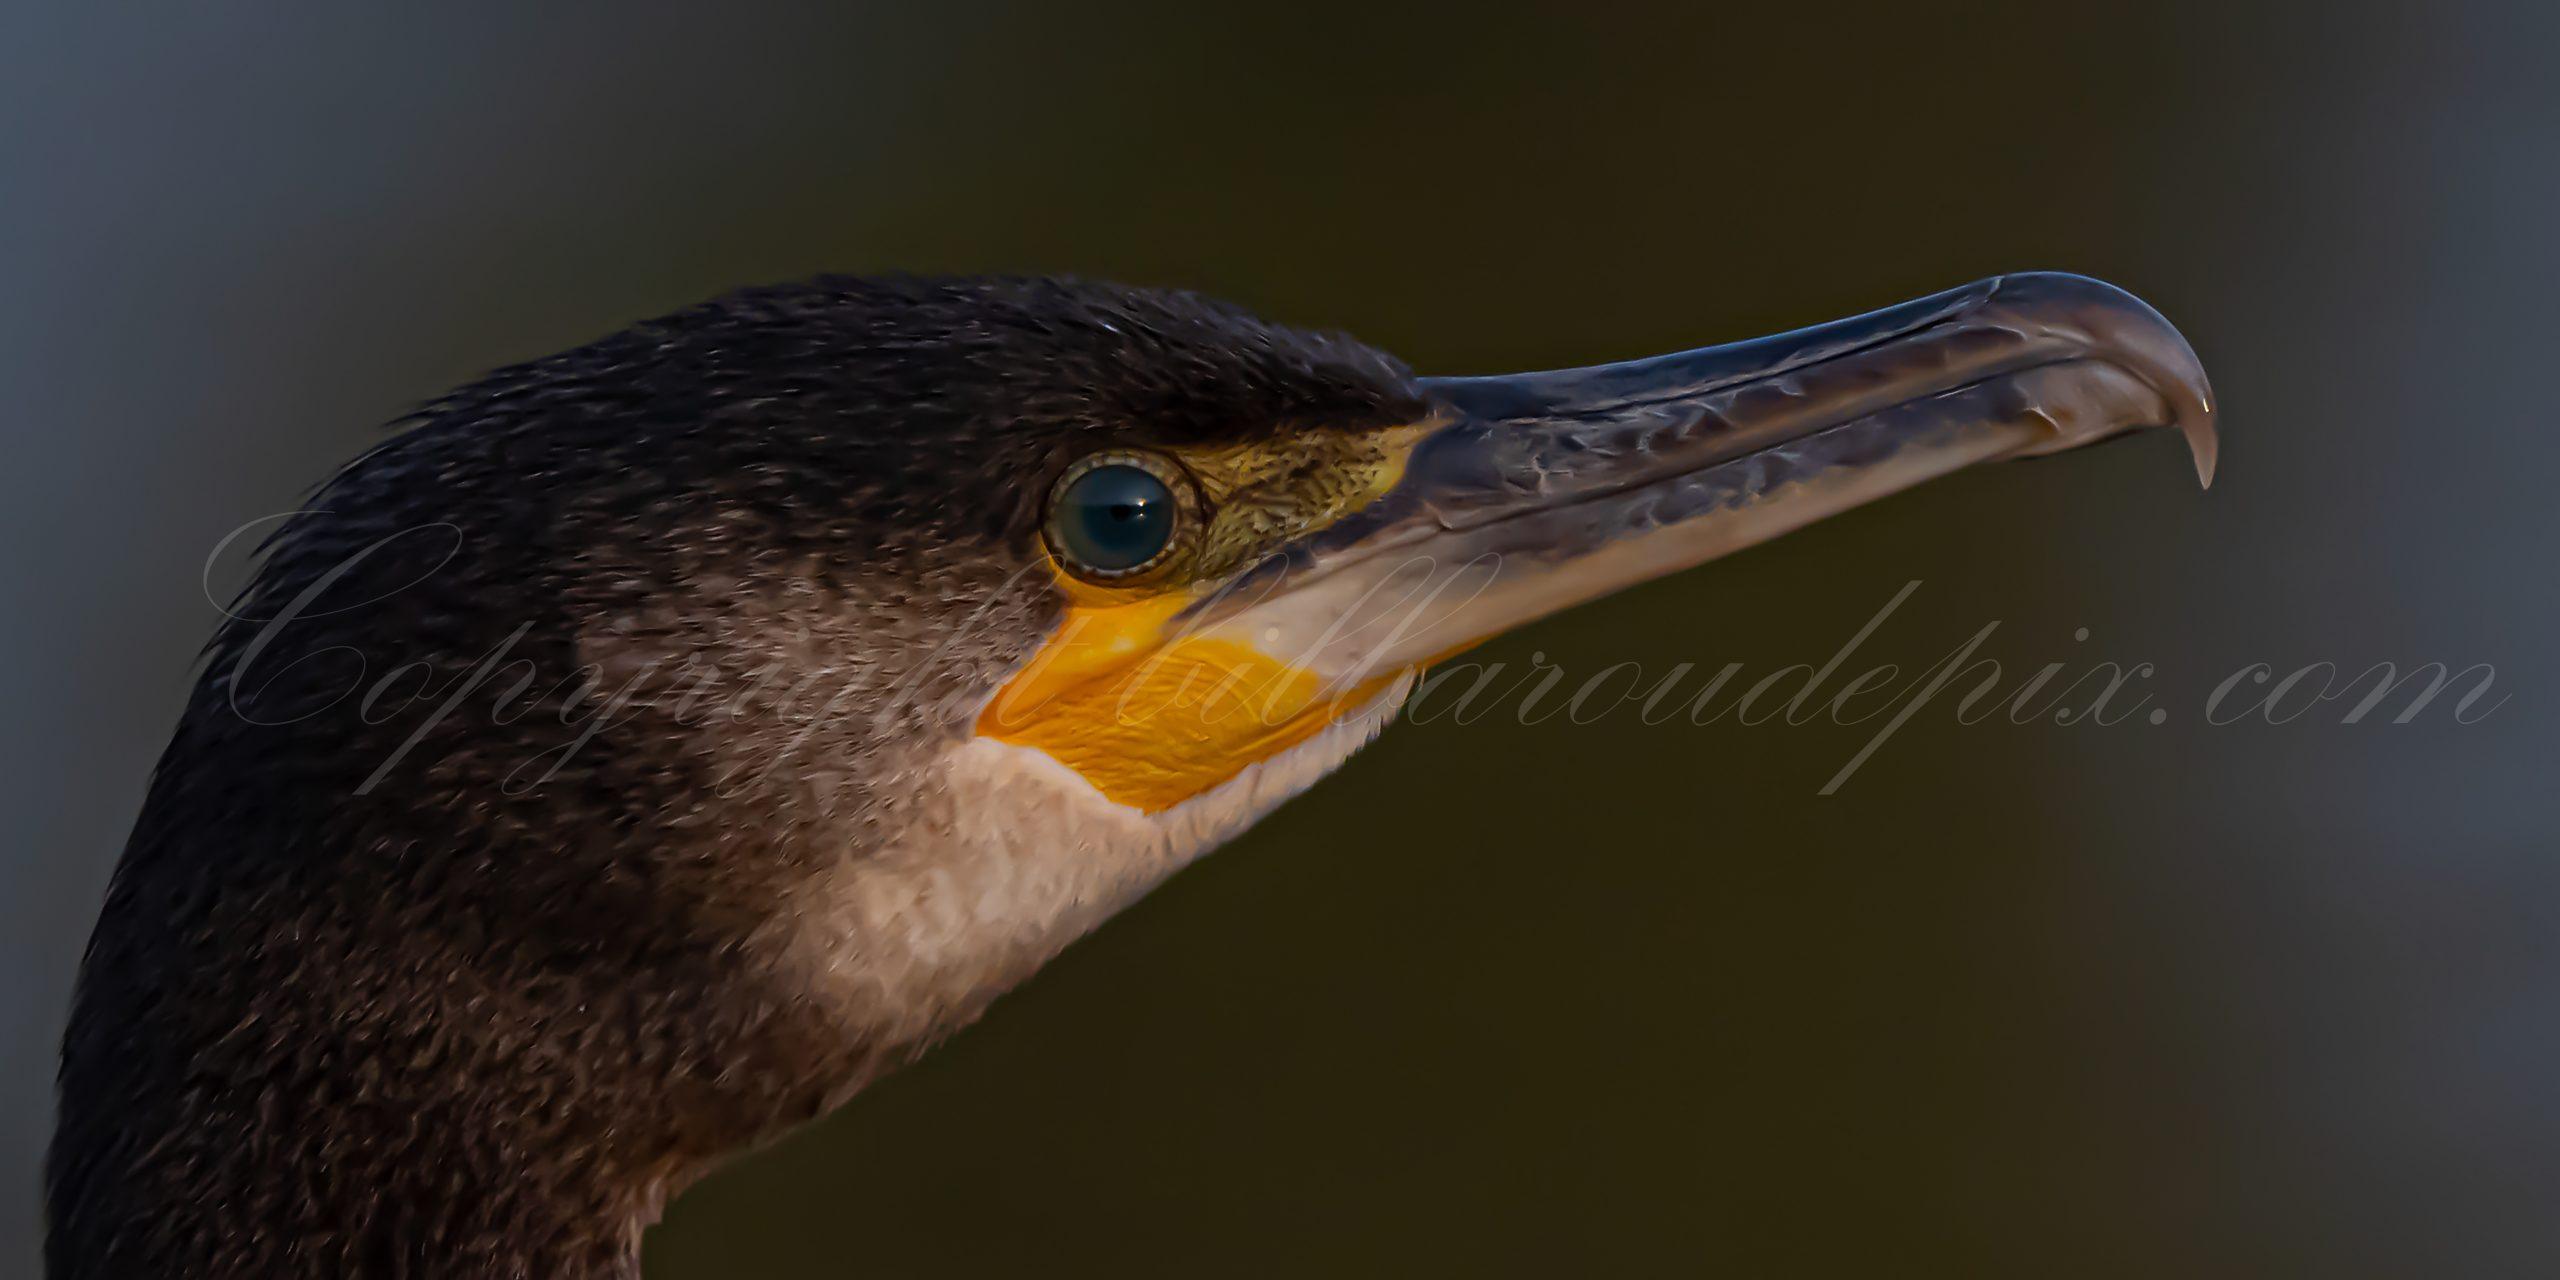 Le regard du grand cormoran